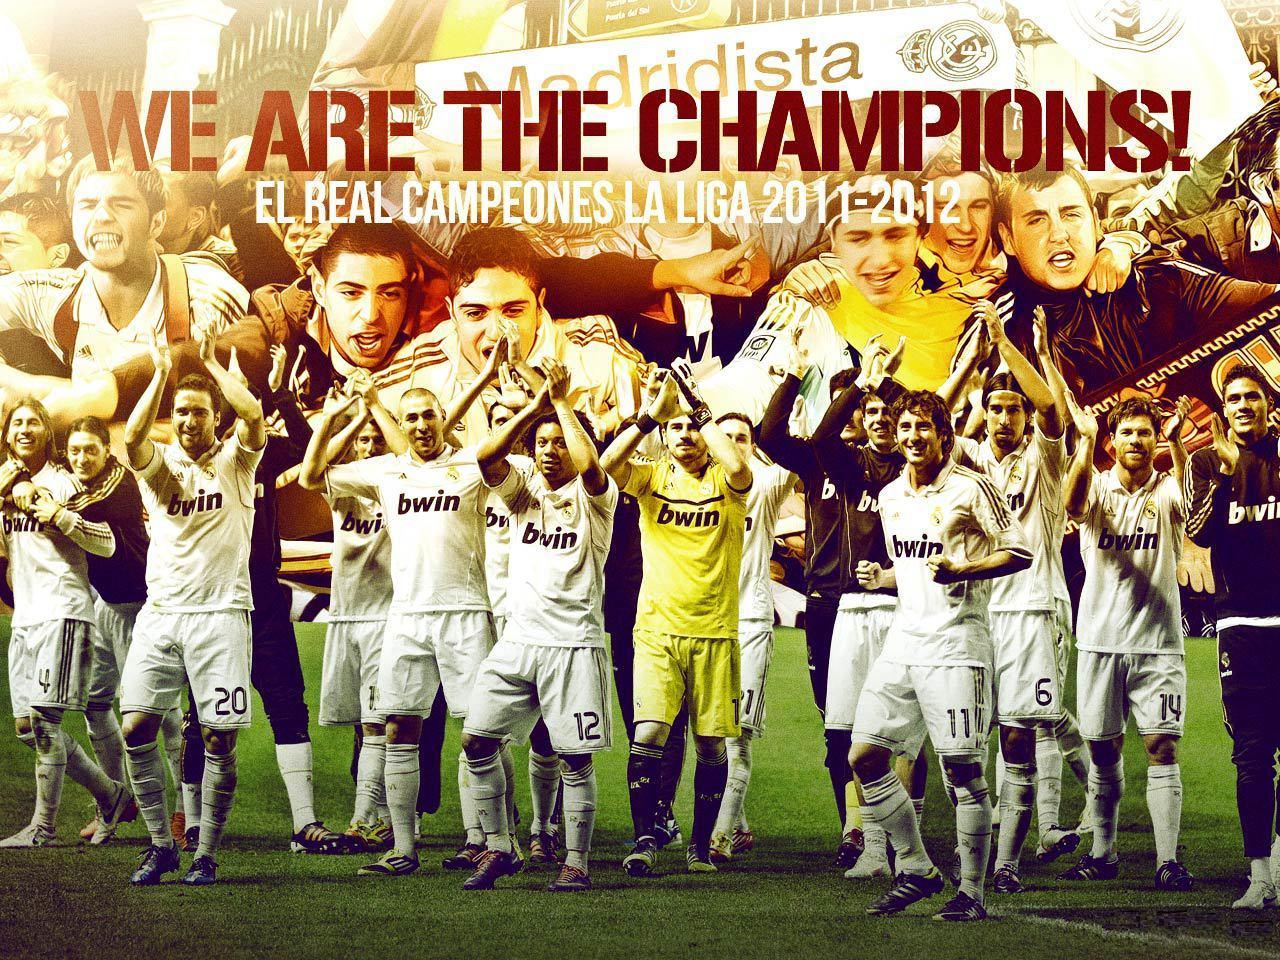 http://3.bp.blogspot.com/-c5-FwqhFd8Q/UCrkP7IchQI/AAAAAAAABJA/9_gZ0J026Nc/s1600/Real-Madrid-Soccer-Wallpaper-2012-02.jpg